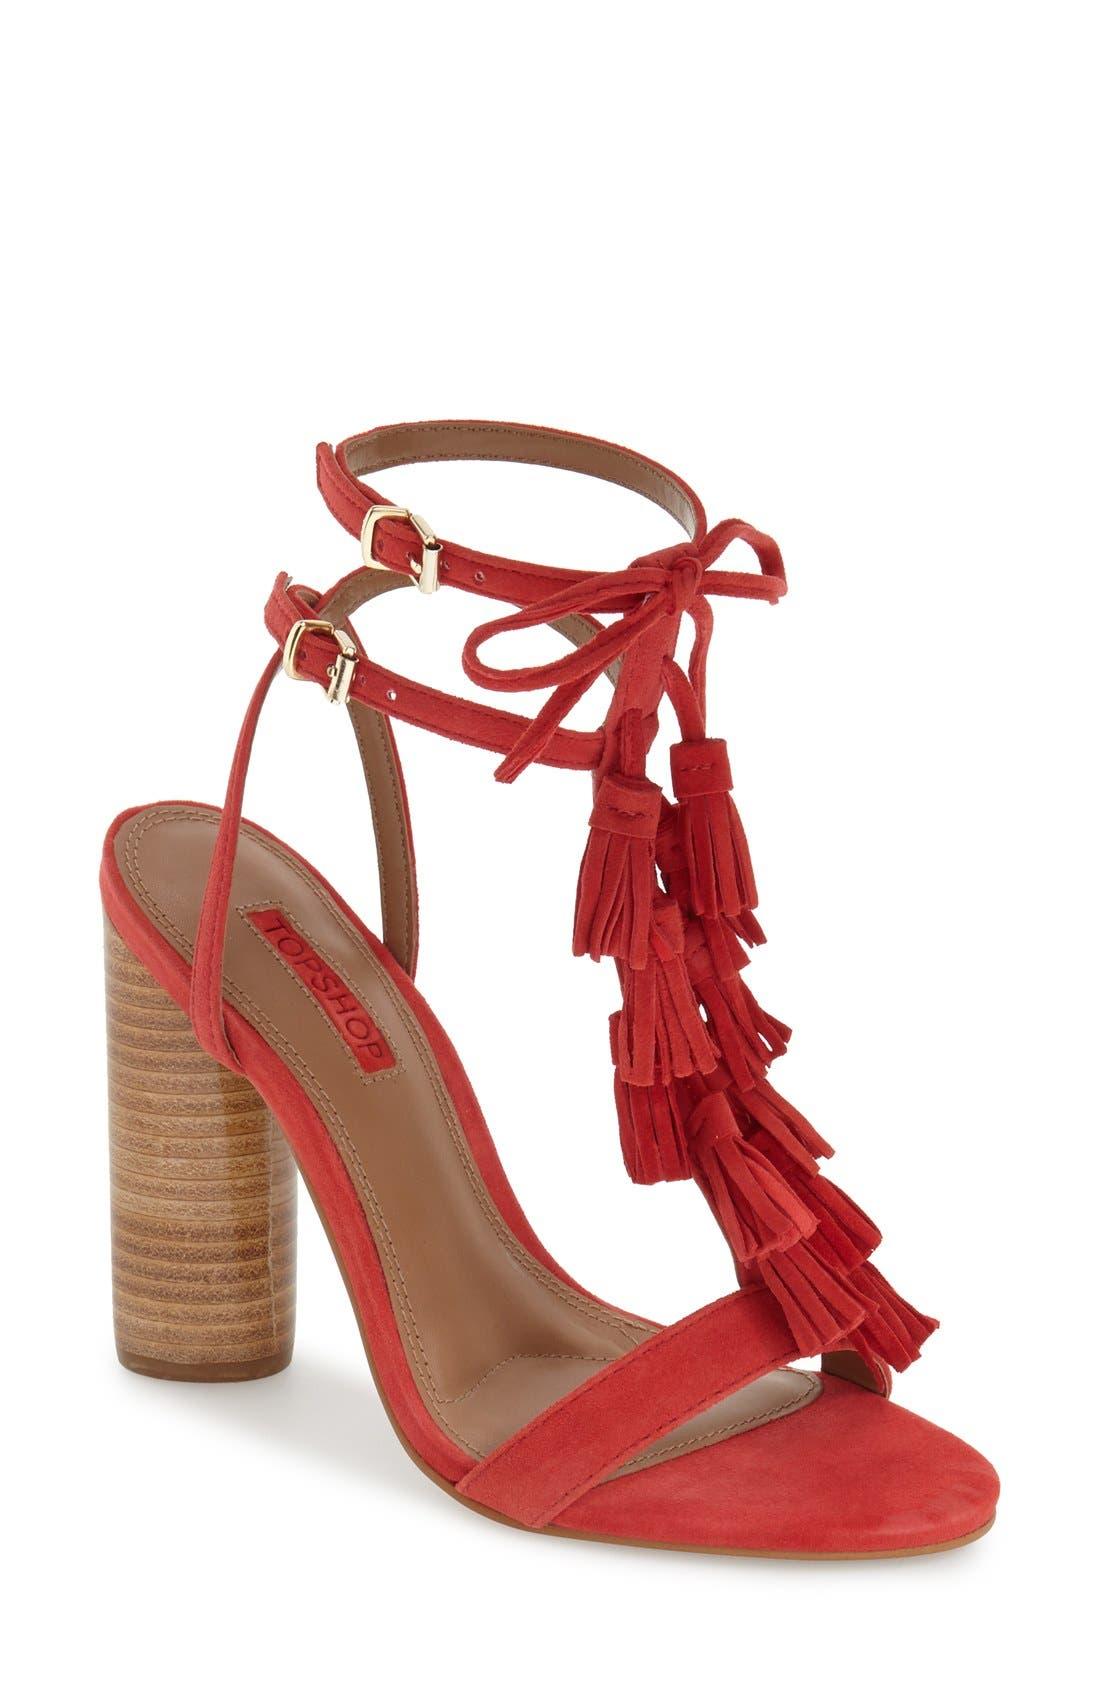 Main Image - Topshop 'Ripple' Tasseled Round Heel Sandal (Women)